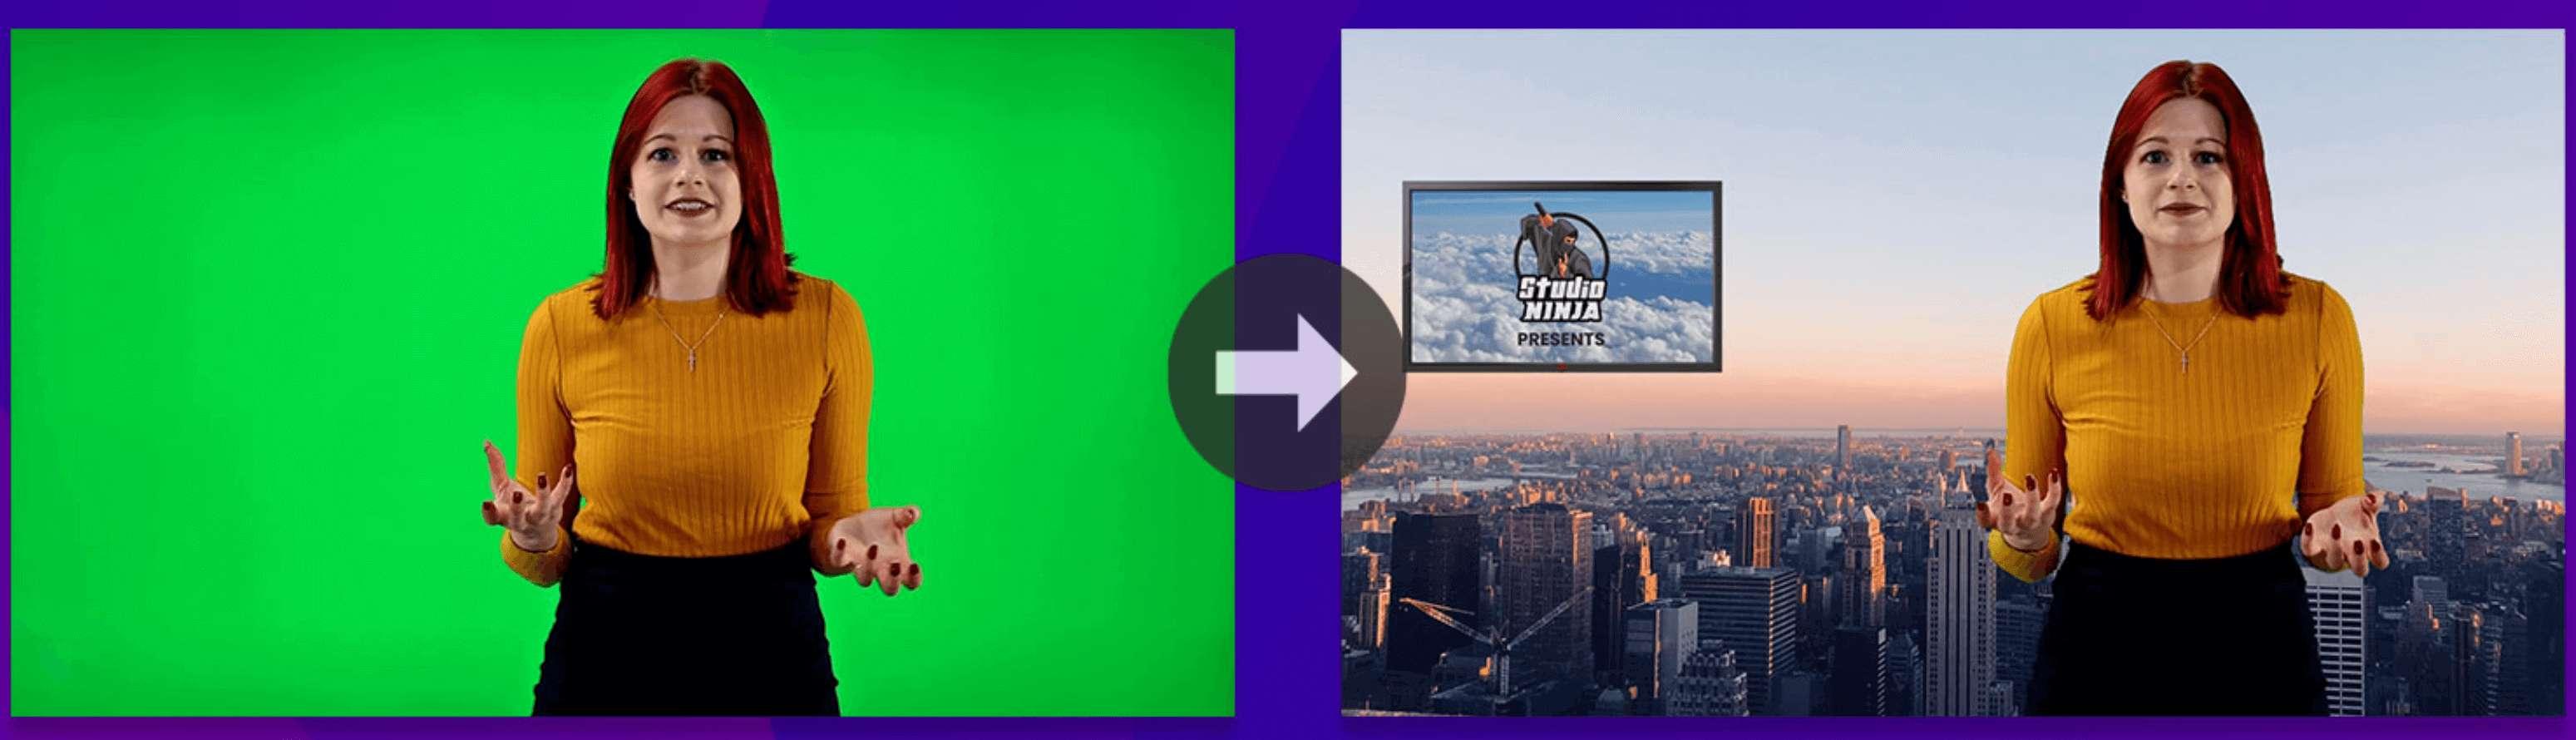 ninja studio green screen example